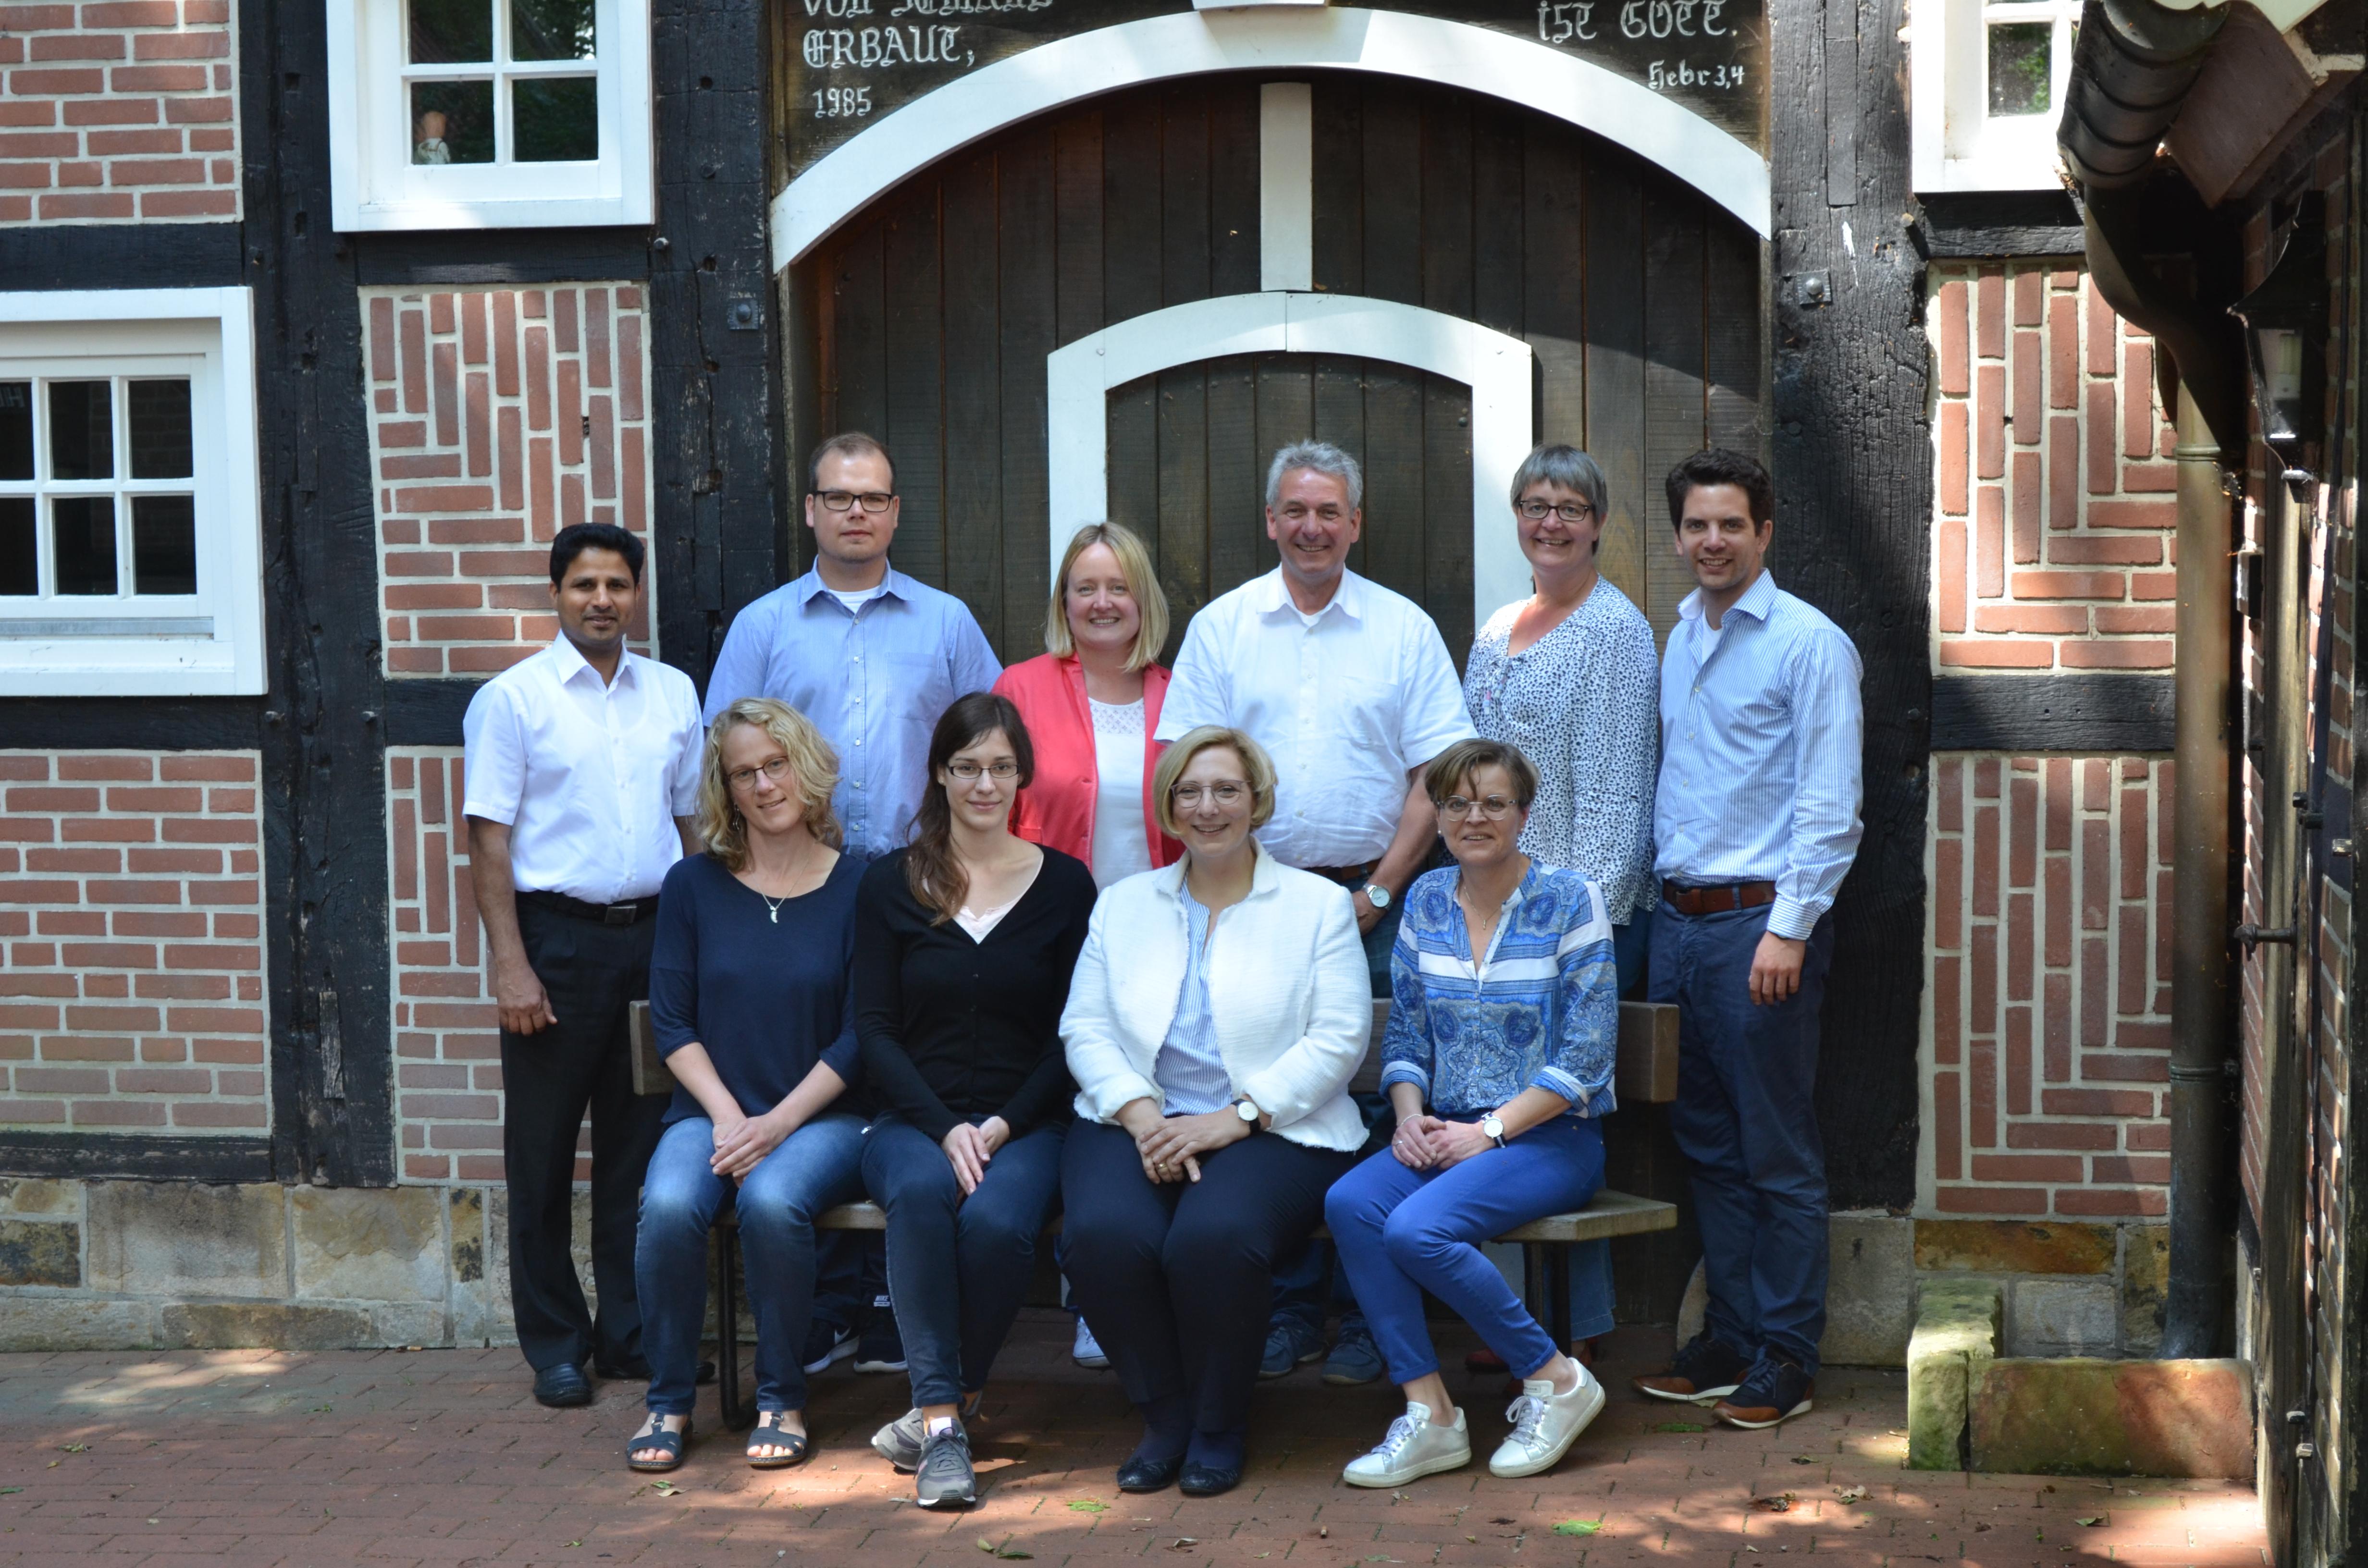 Dr. Daniela De Ridder zu Gast im Ludwig-Windthorst-Haus in Lingen